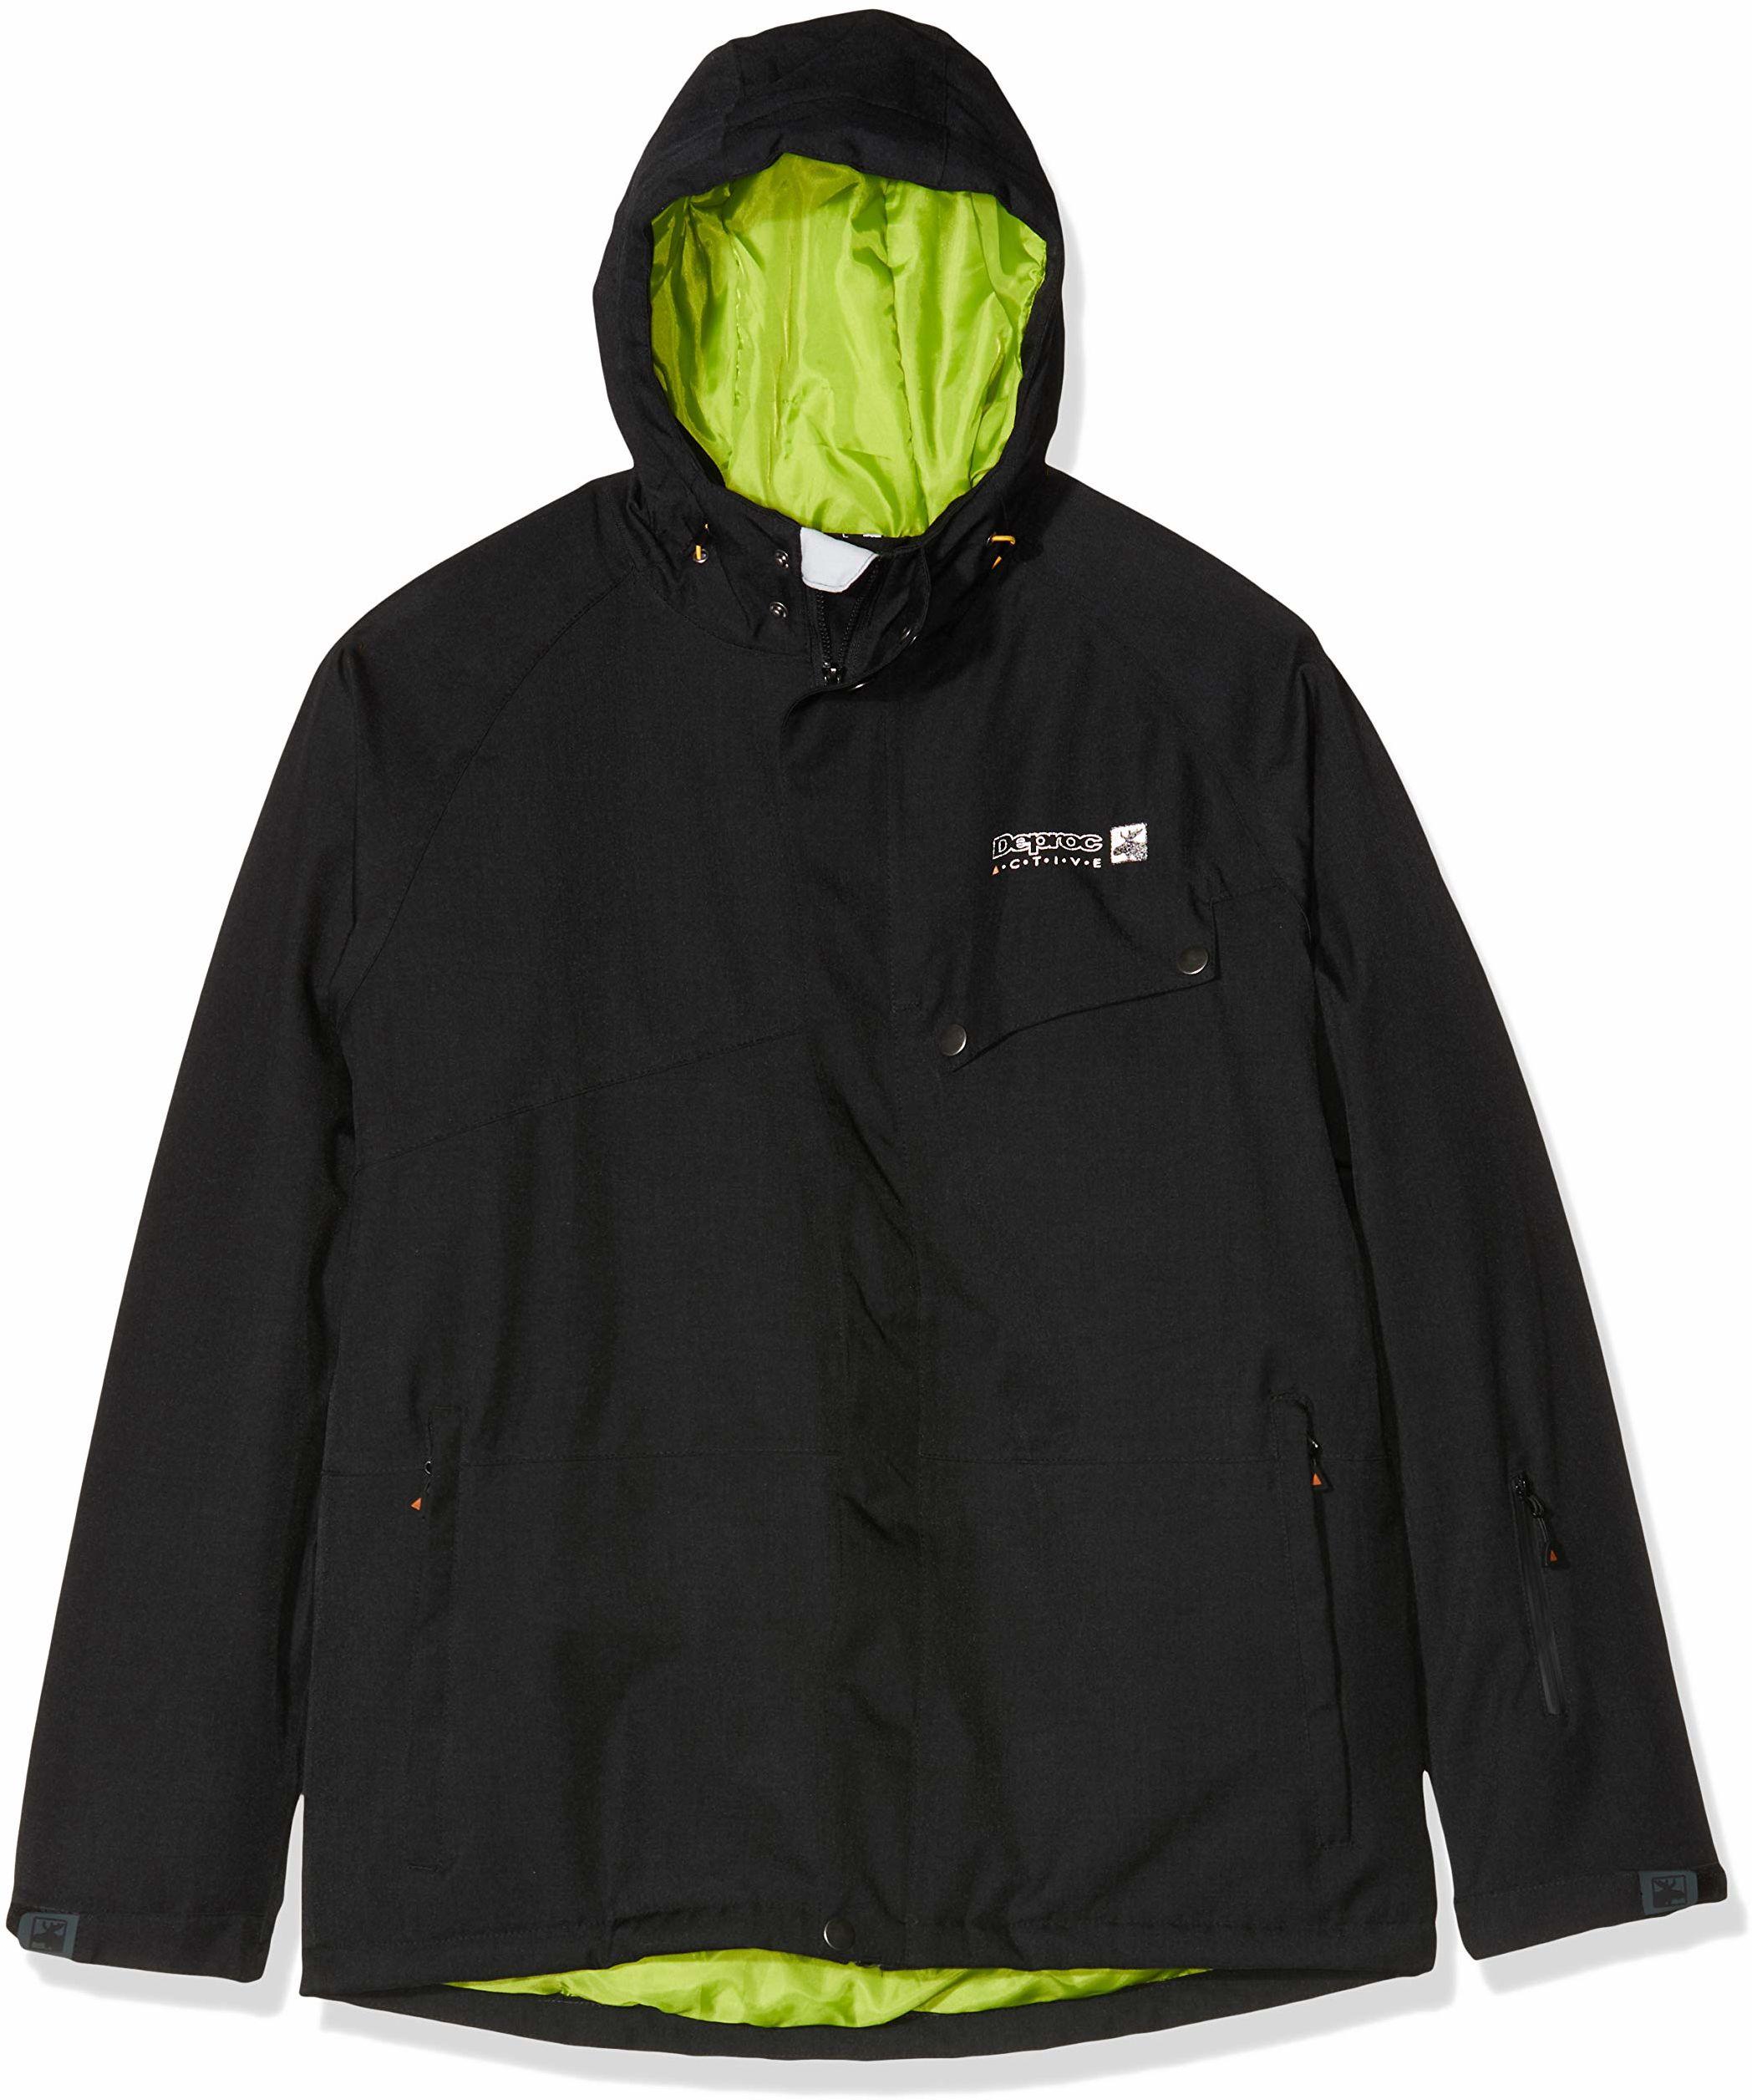 DEPROC-Active Alaska męska kurtka narciarska czarny czarny S